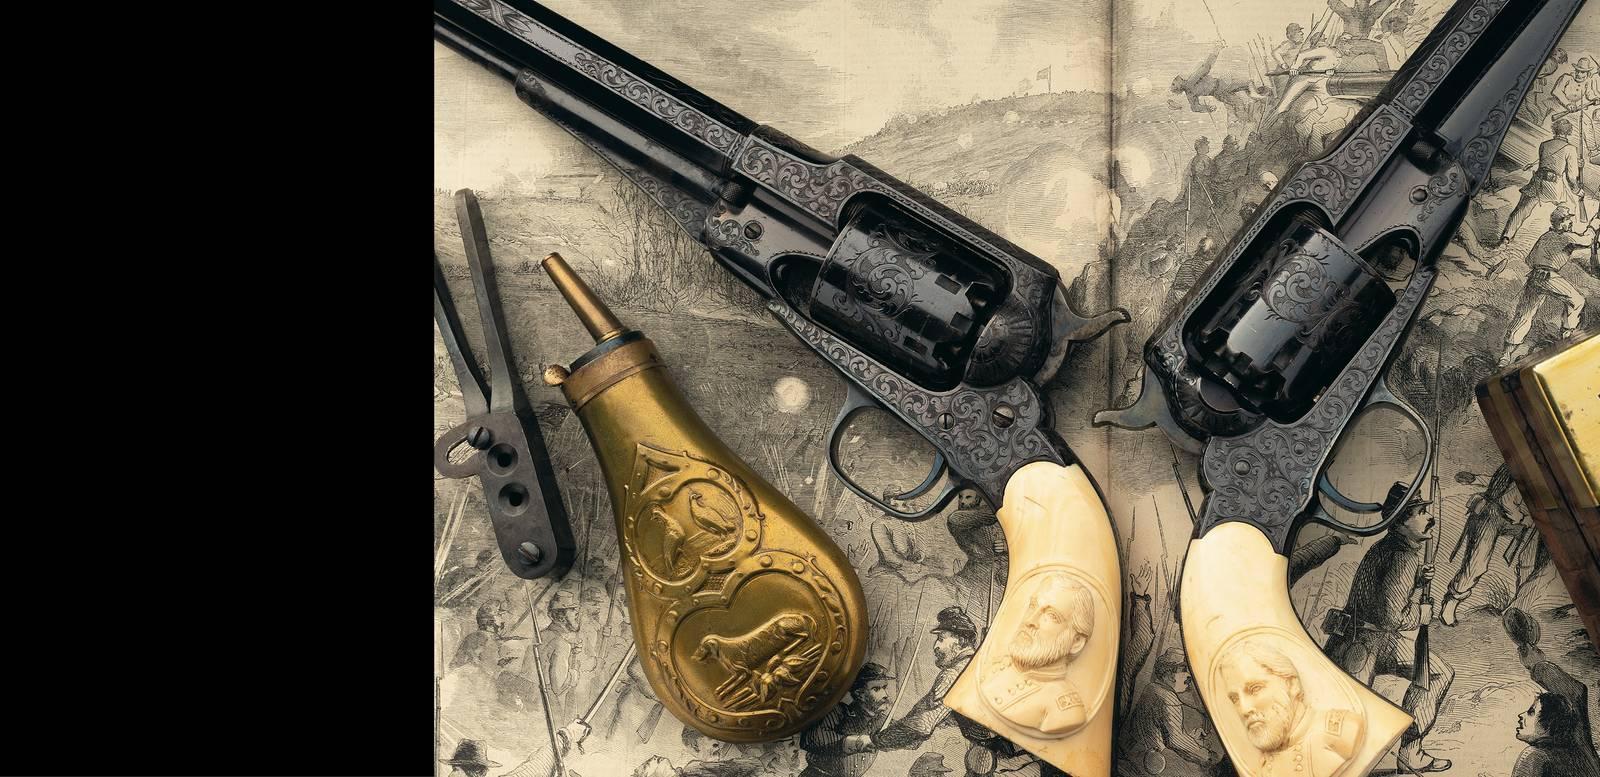 Premier Auction: Fine, Historic & Investment Grade Firearms